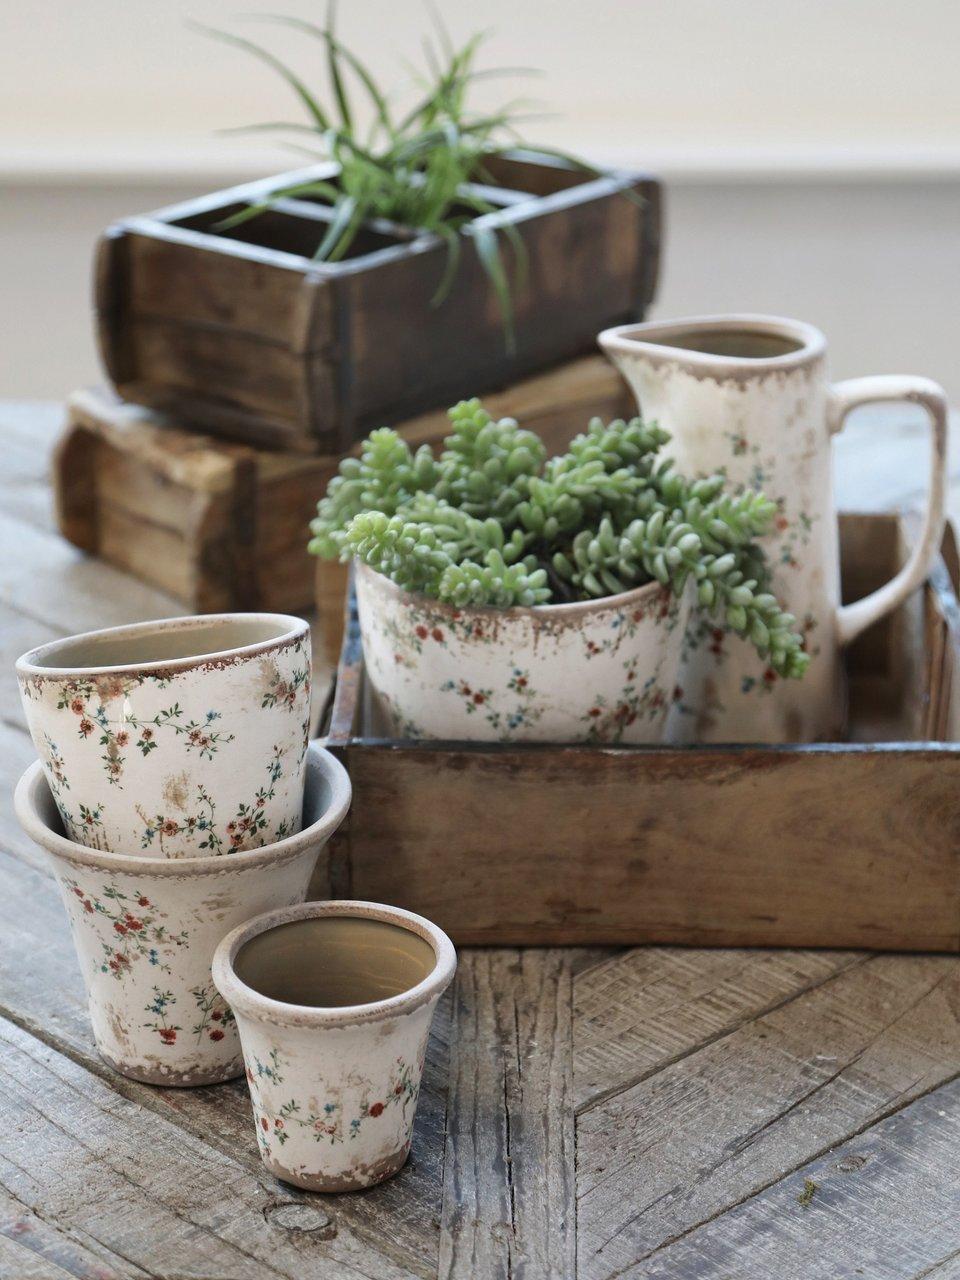 Tulle Keramik trifft Holz Unikate